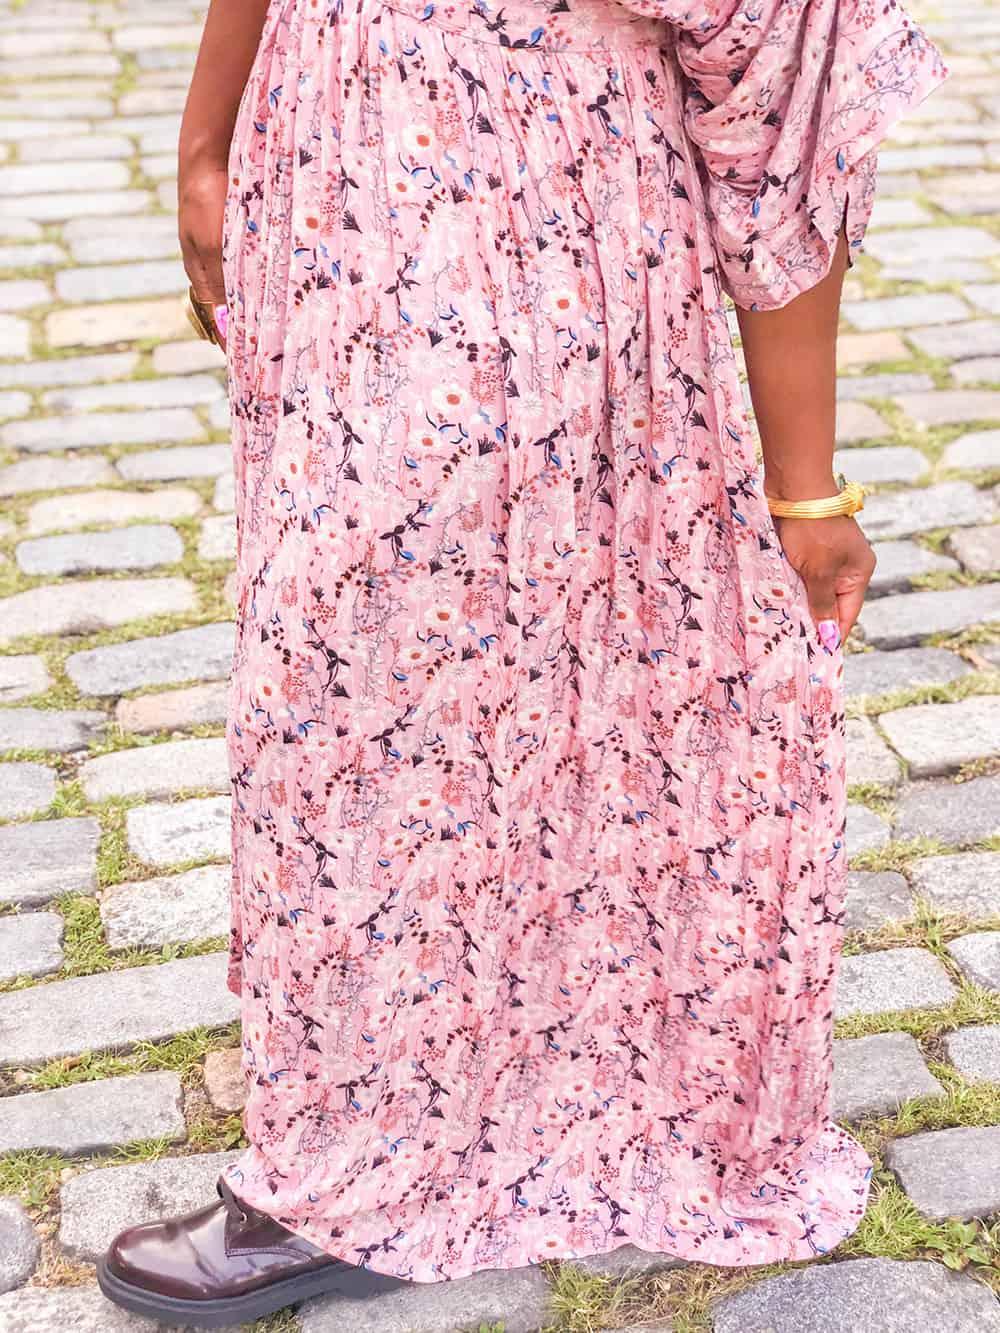 SheIn romantic floral dress